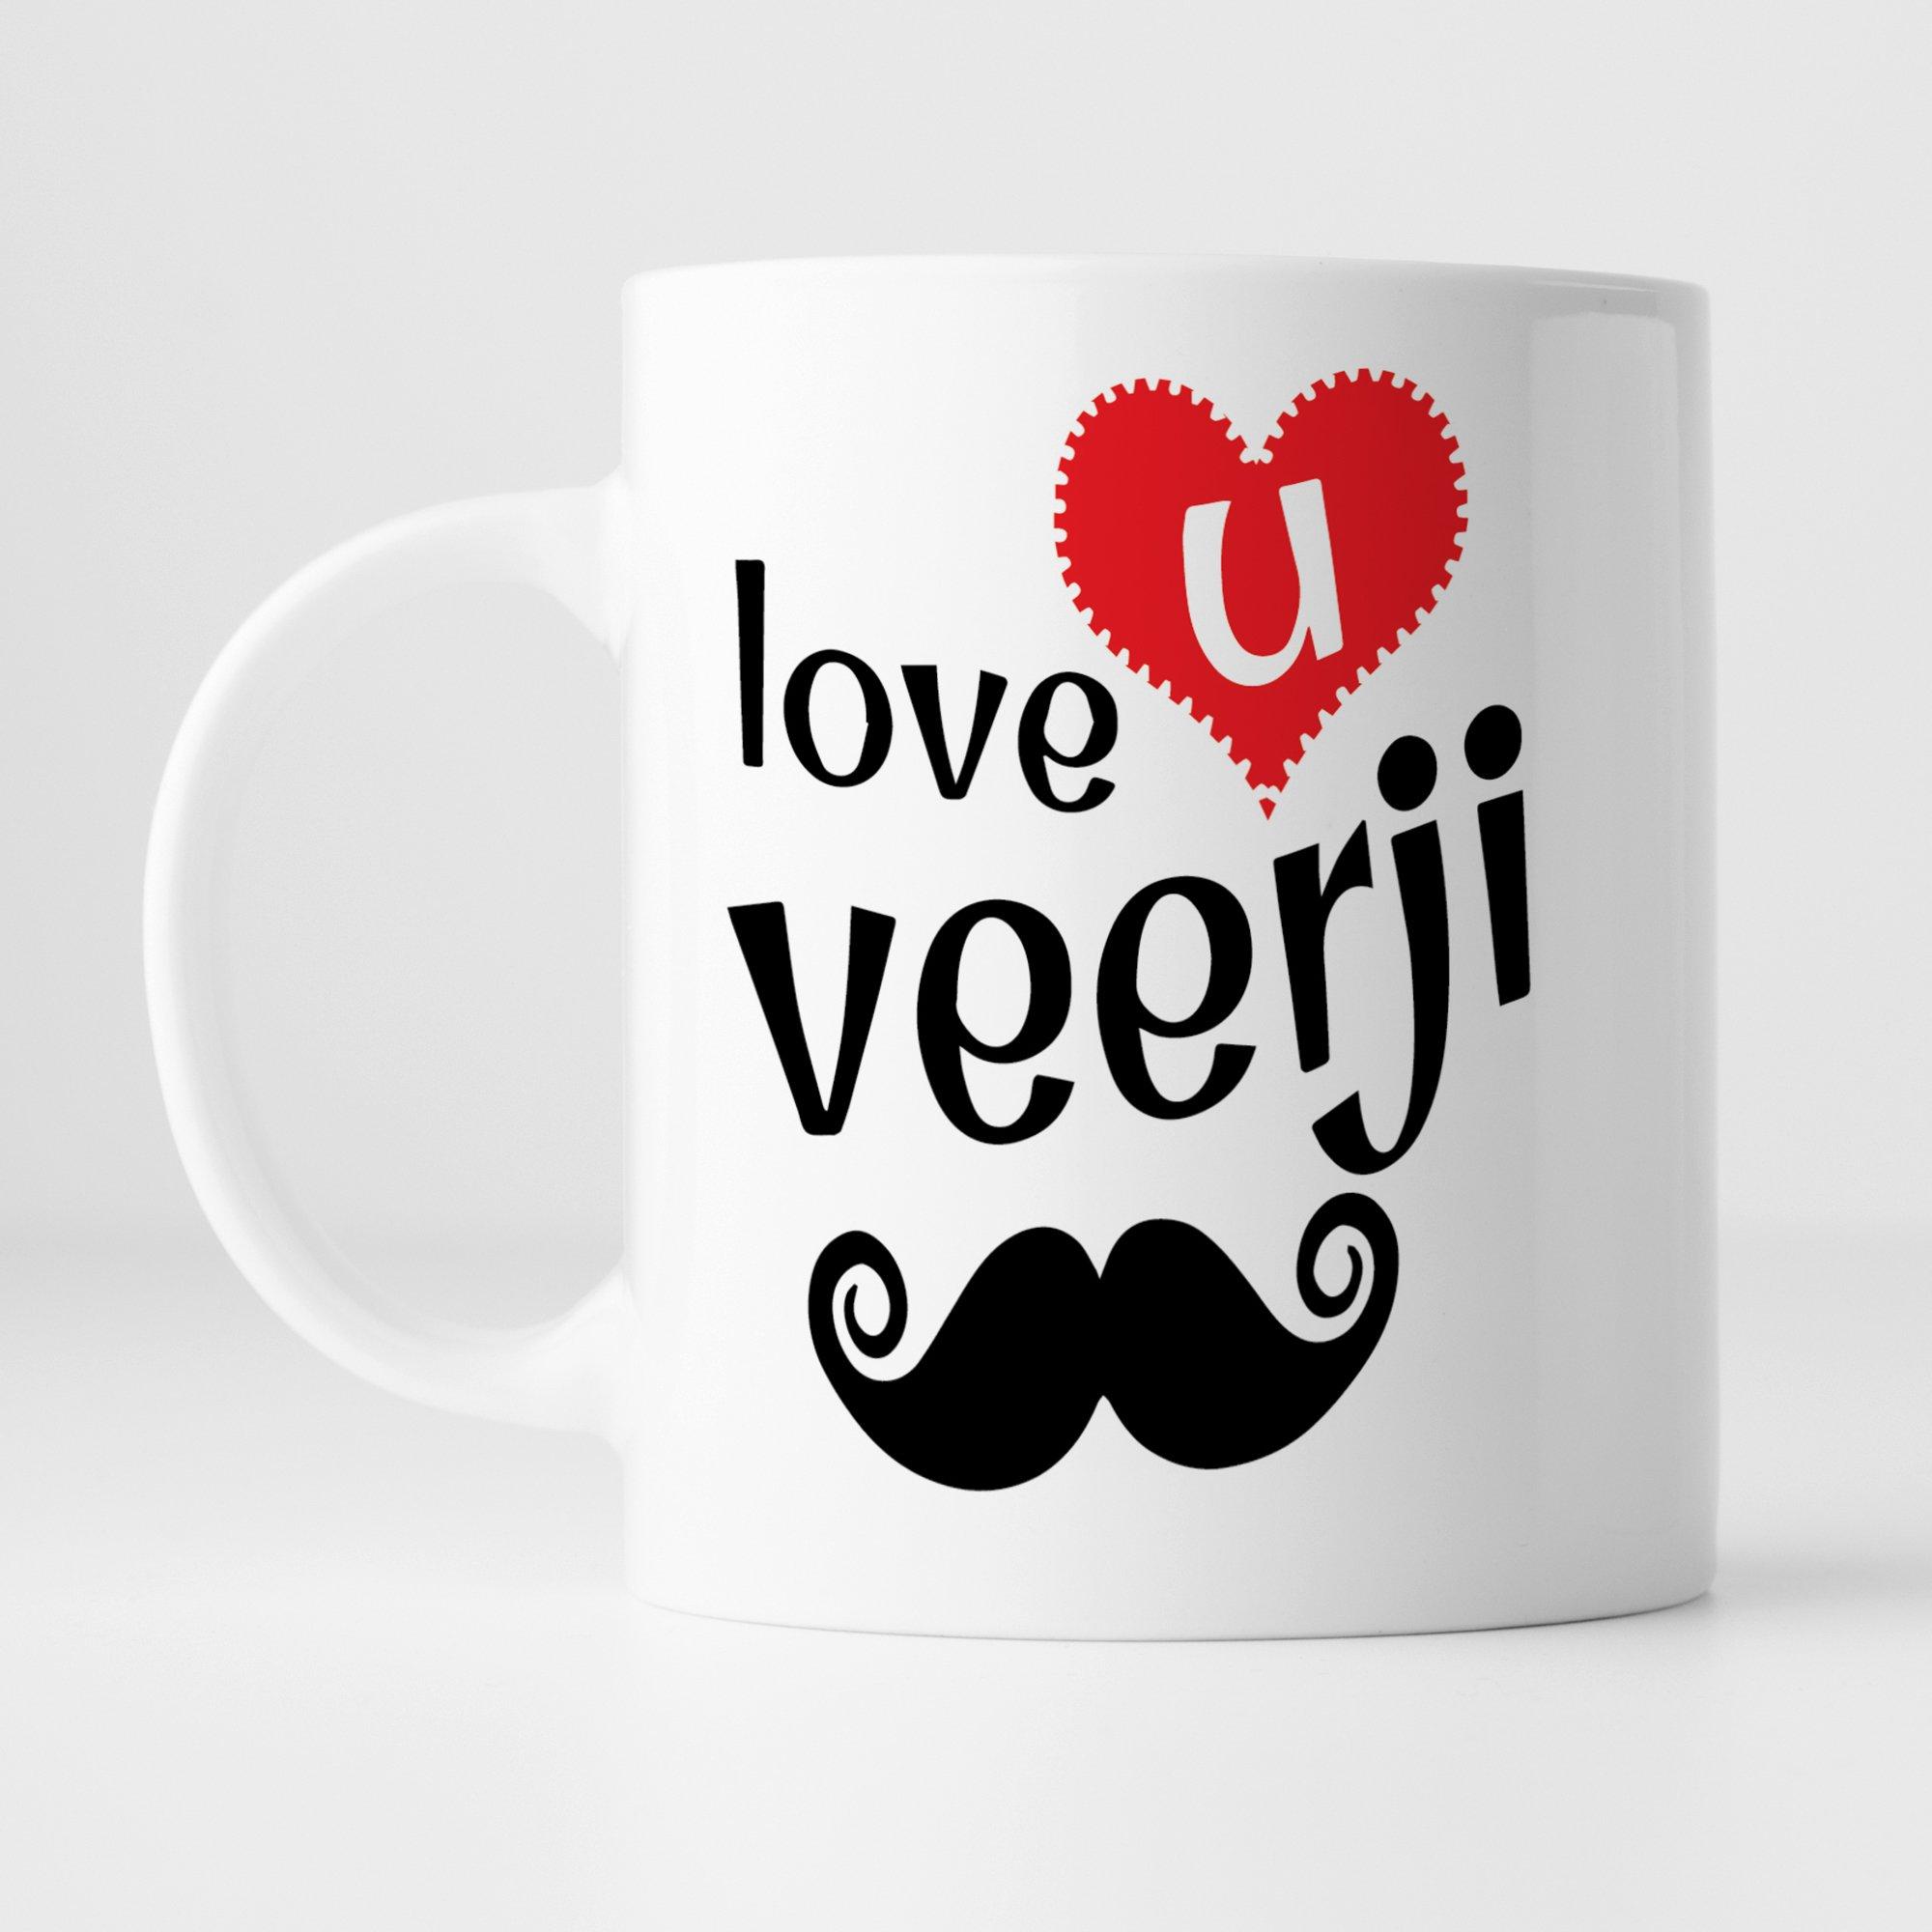 Ceramic Mug |Happy Raksha Bandhan | Rakshabandhan Gift For Brother |Rakhi Gift For Sister |Gift For Rakhi Superior Quality Ceramic Mug